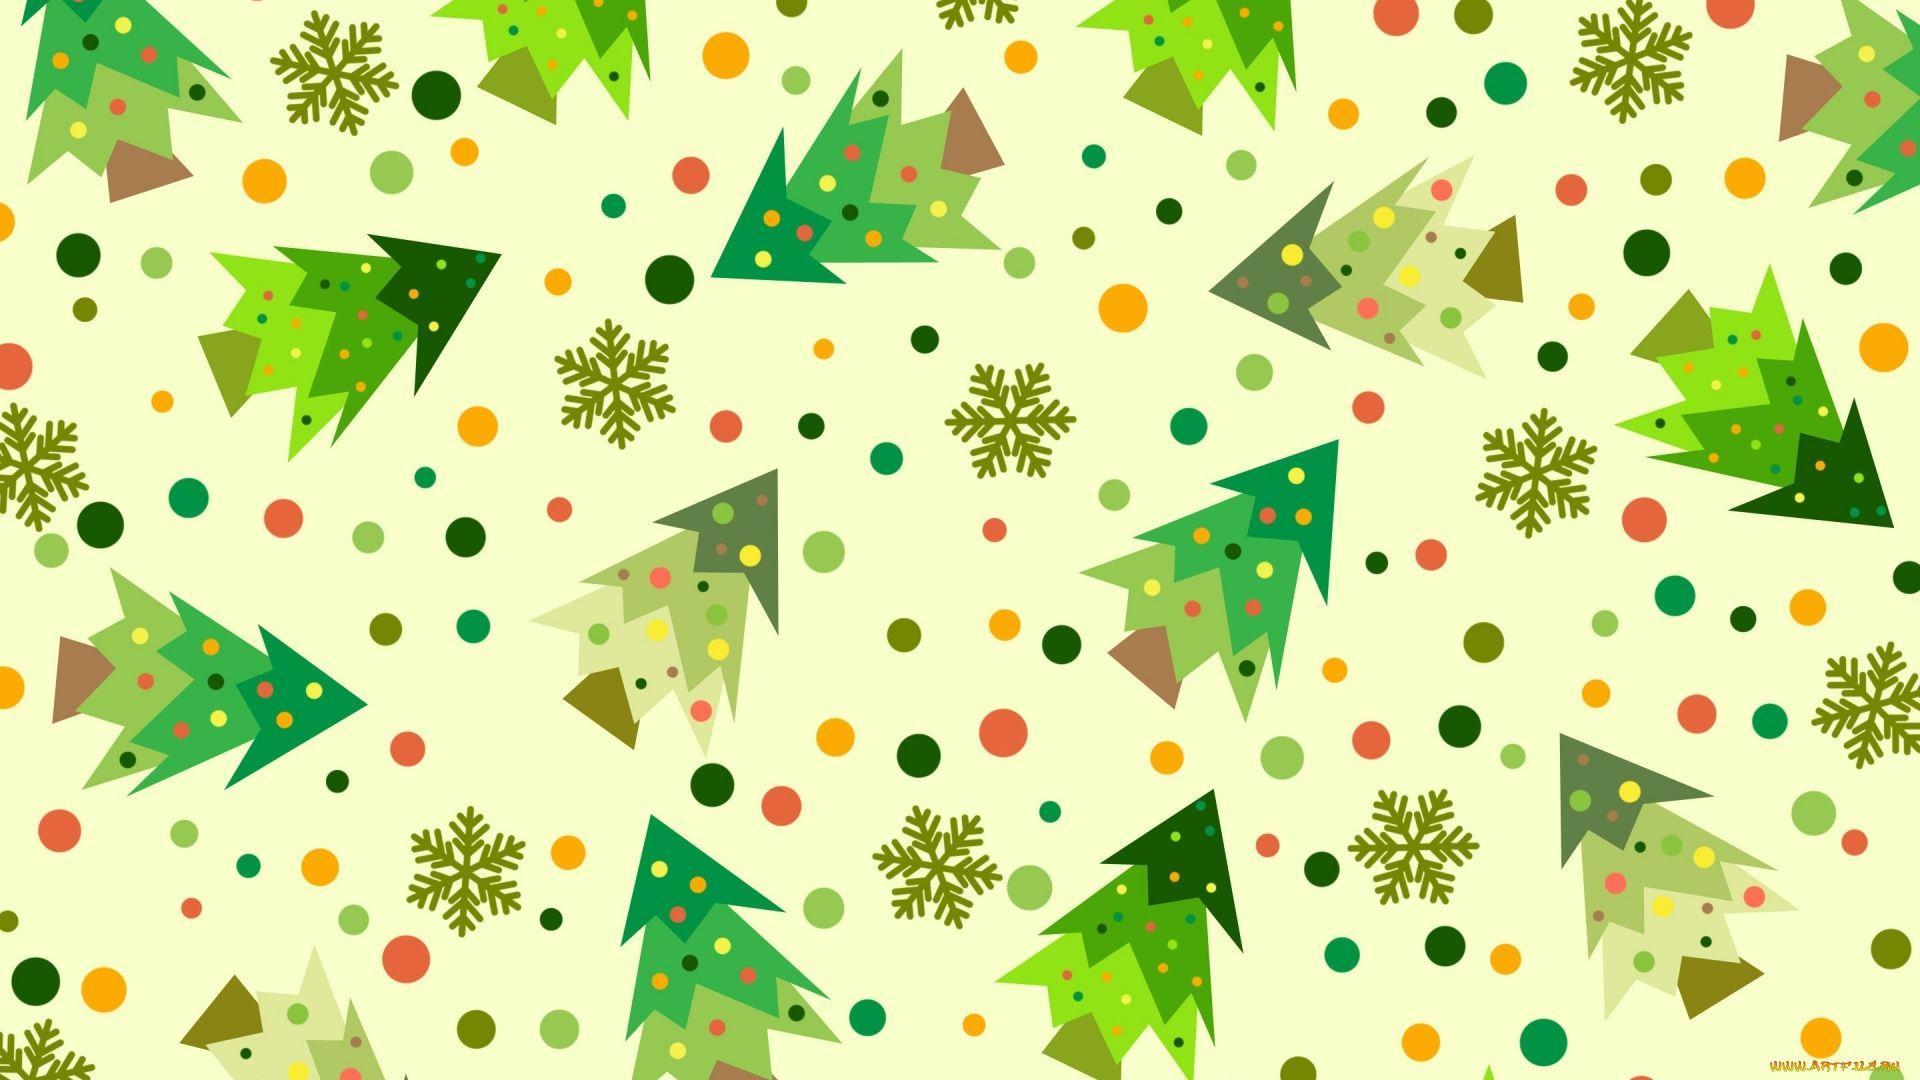 Christmas Scrapbooking 1920x1080 wallpaper